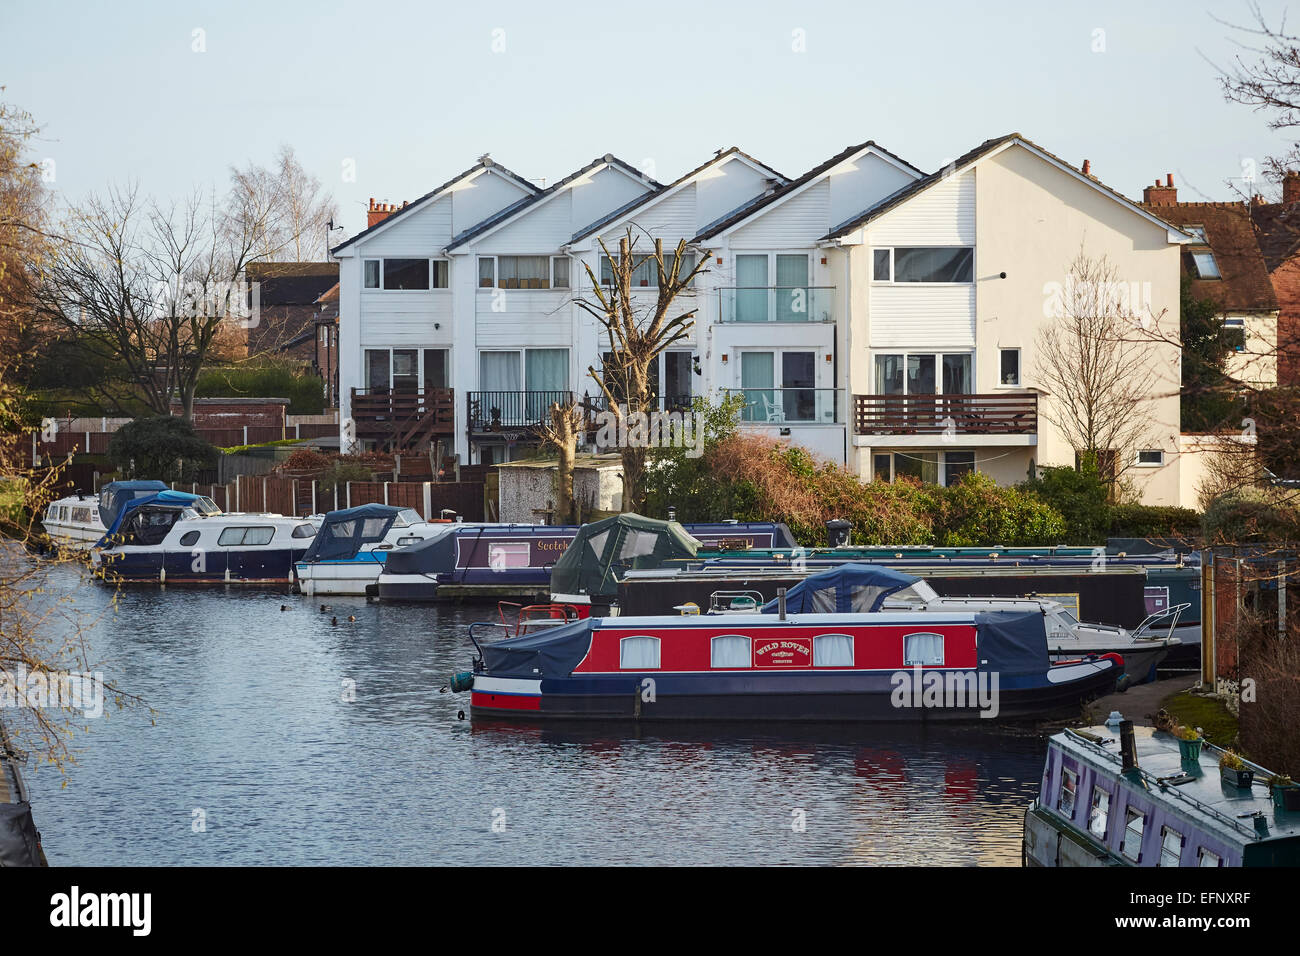 Stockton Heath civil parish suburb of Warrington, Cheshire, England UK . Housing and morings on the Bridgewater - Stock Image